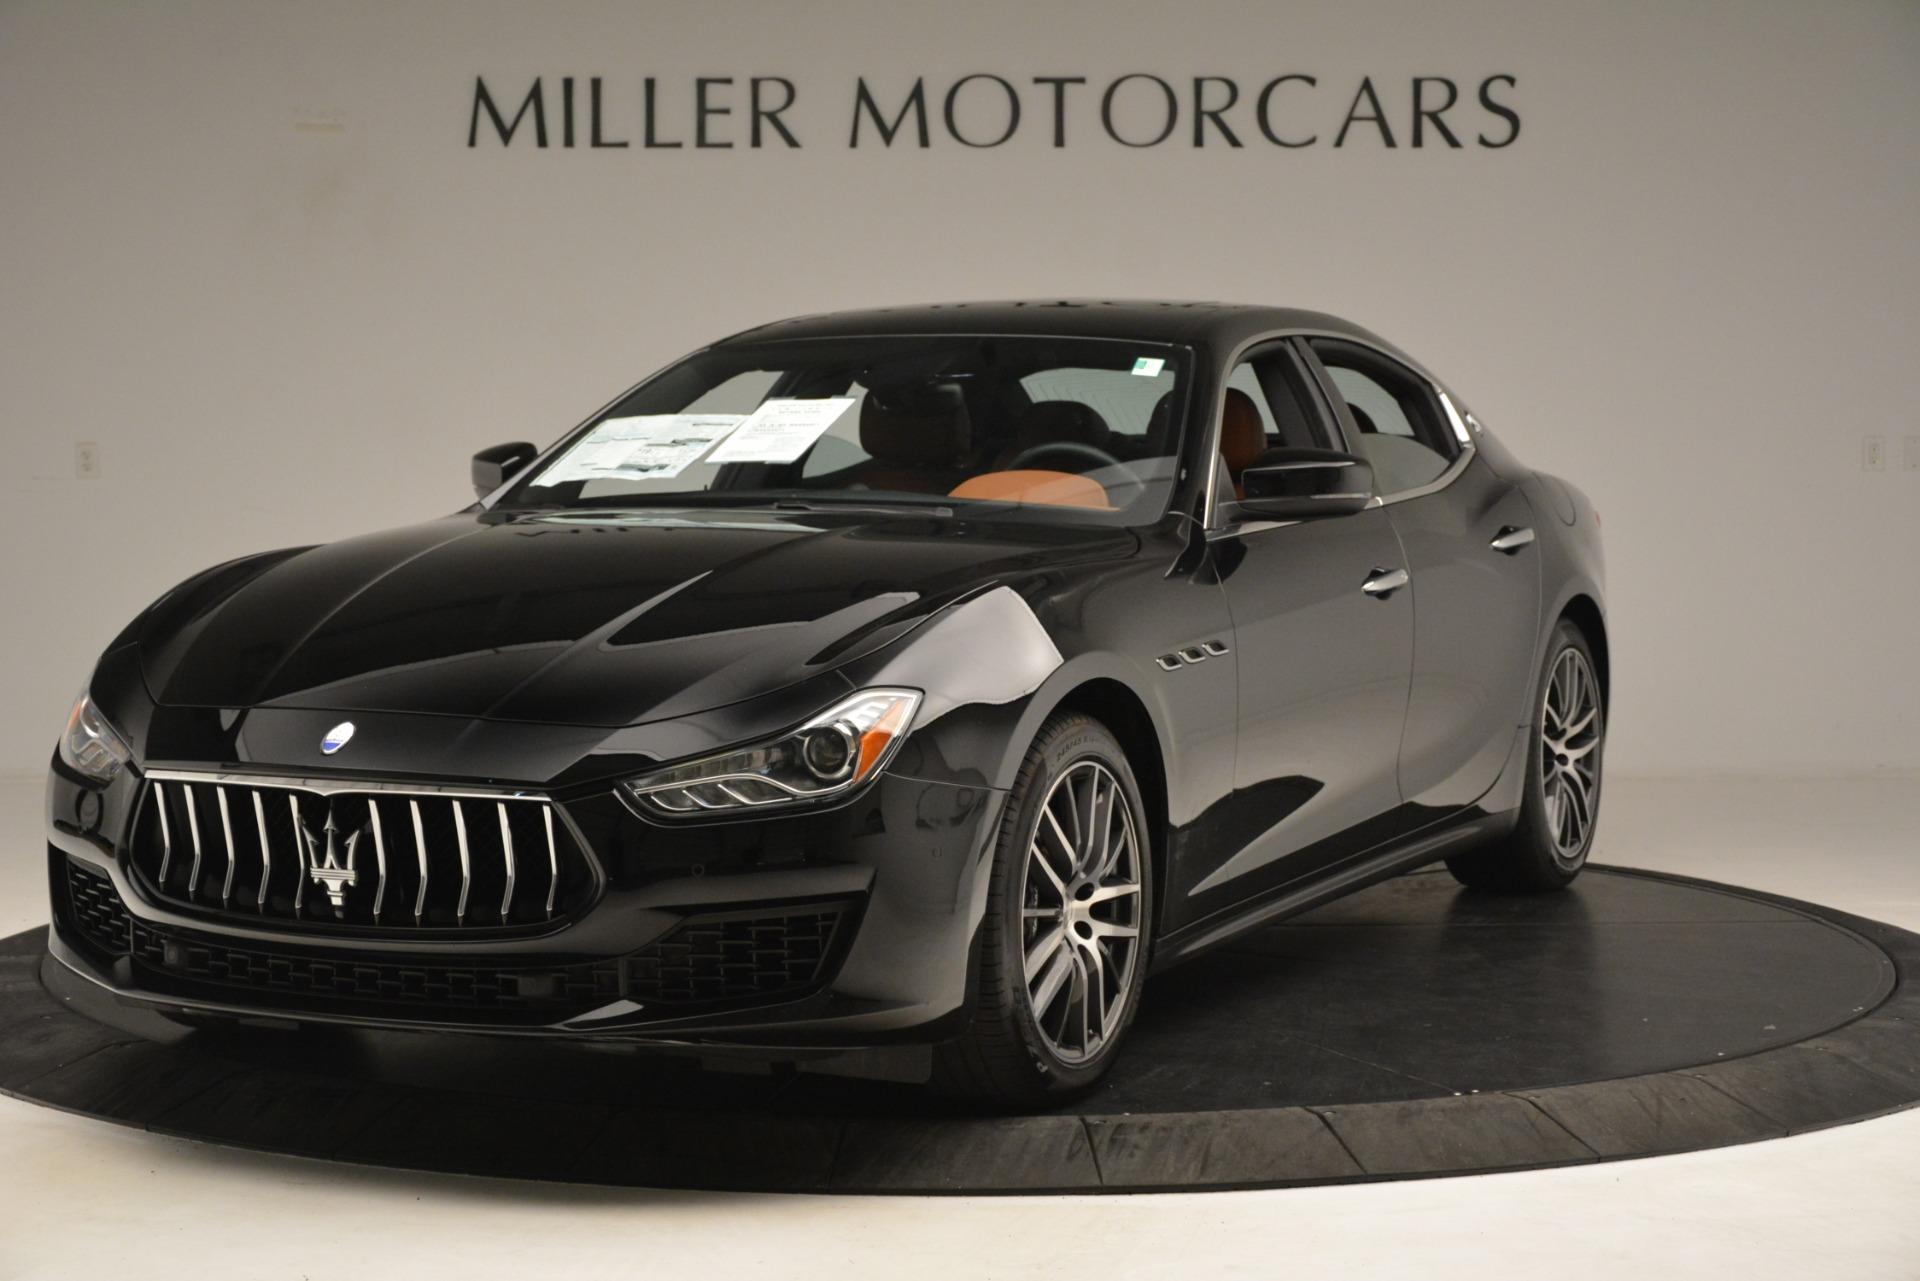 New 2019 Maserati Ghibli S Q4 for sale $57,900 at Aston Martin of Greenwich in Greenwich CT 06830 1